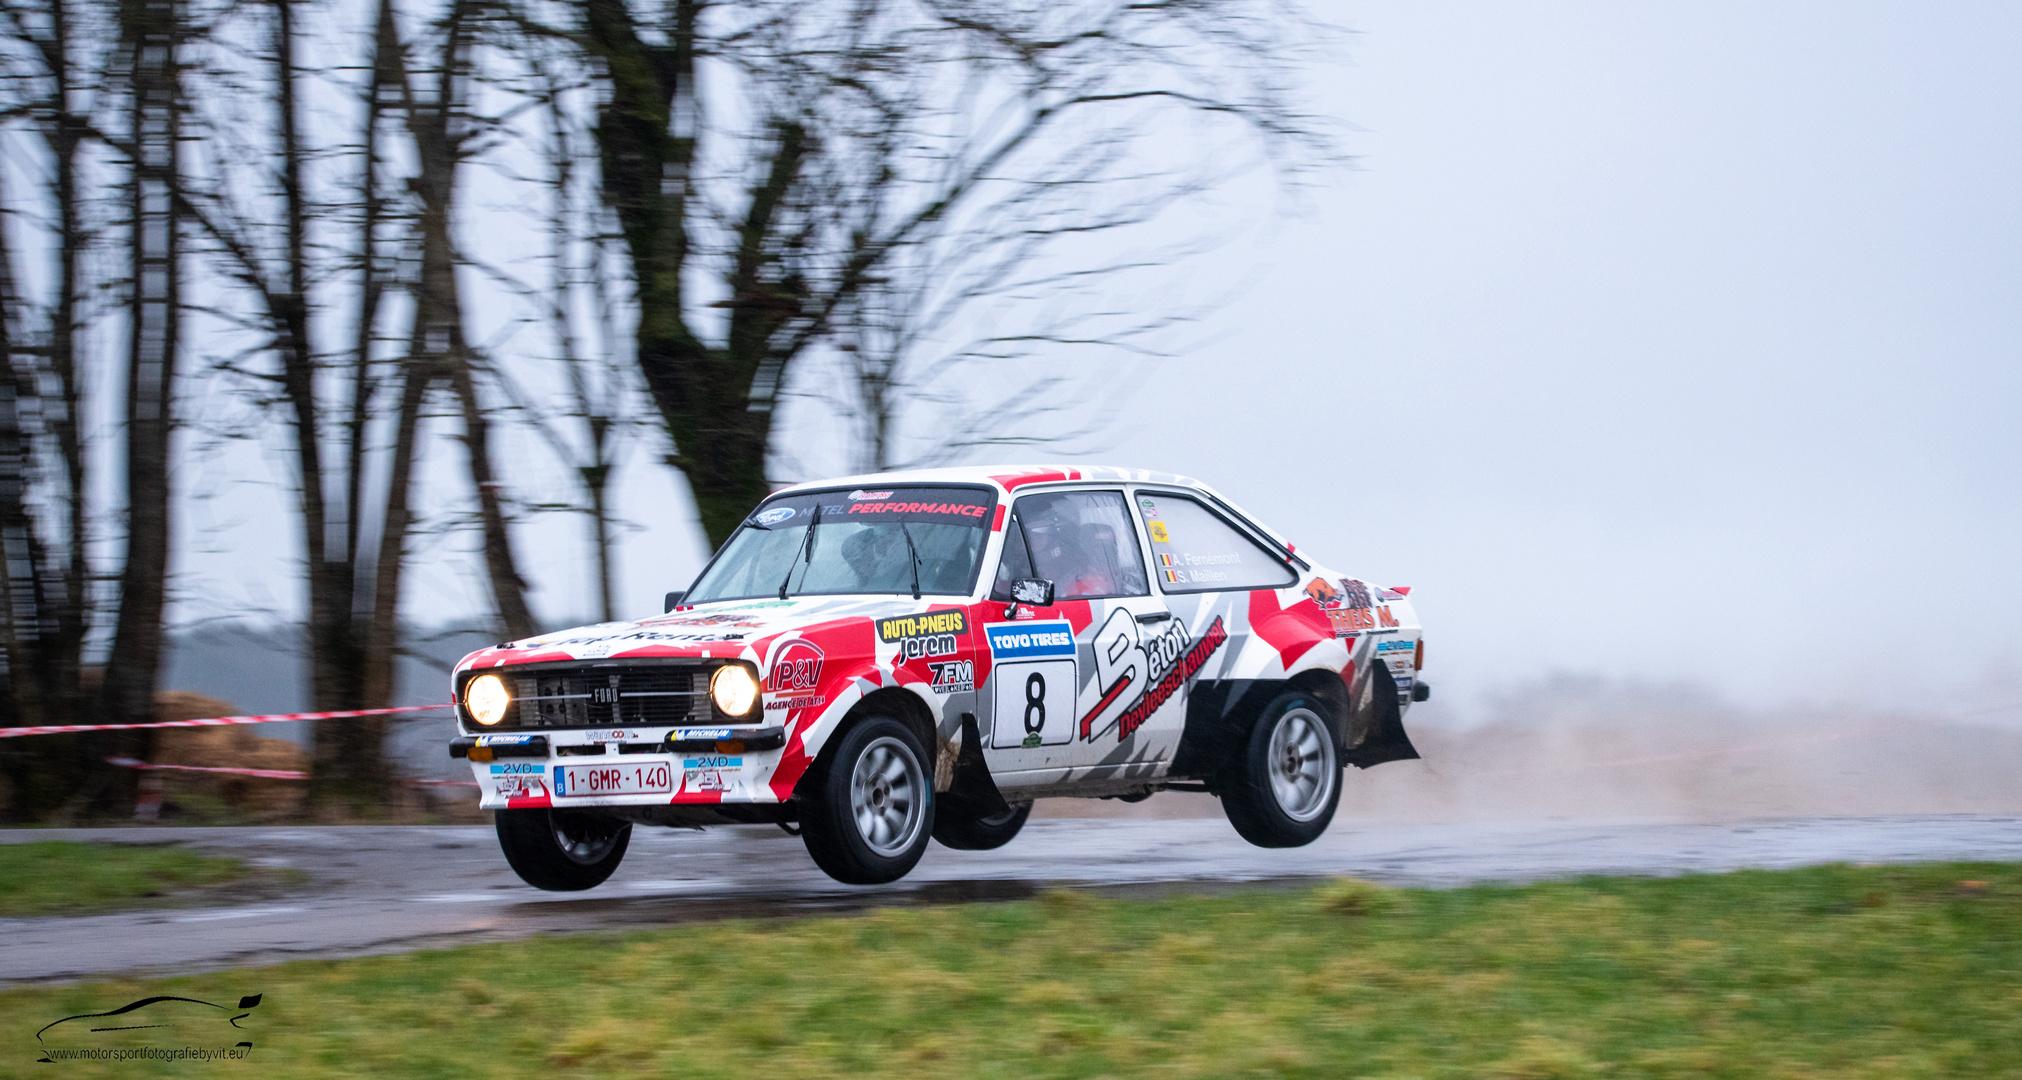 Ford Escort in Rallying Saison 2020 Part 15 Foto & Bild ...